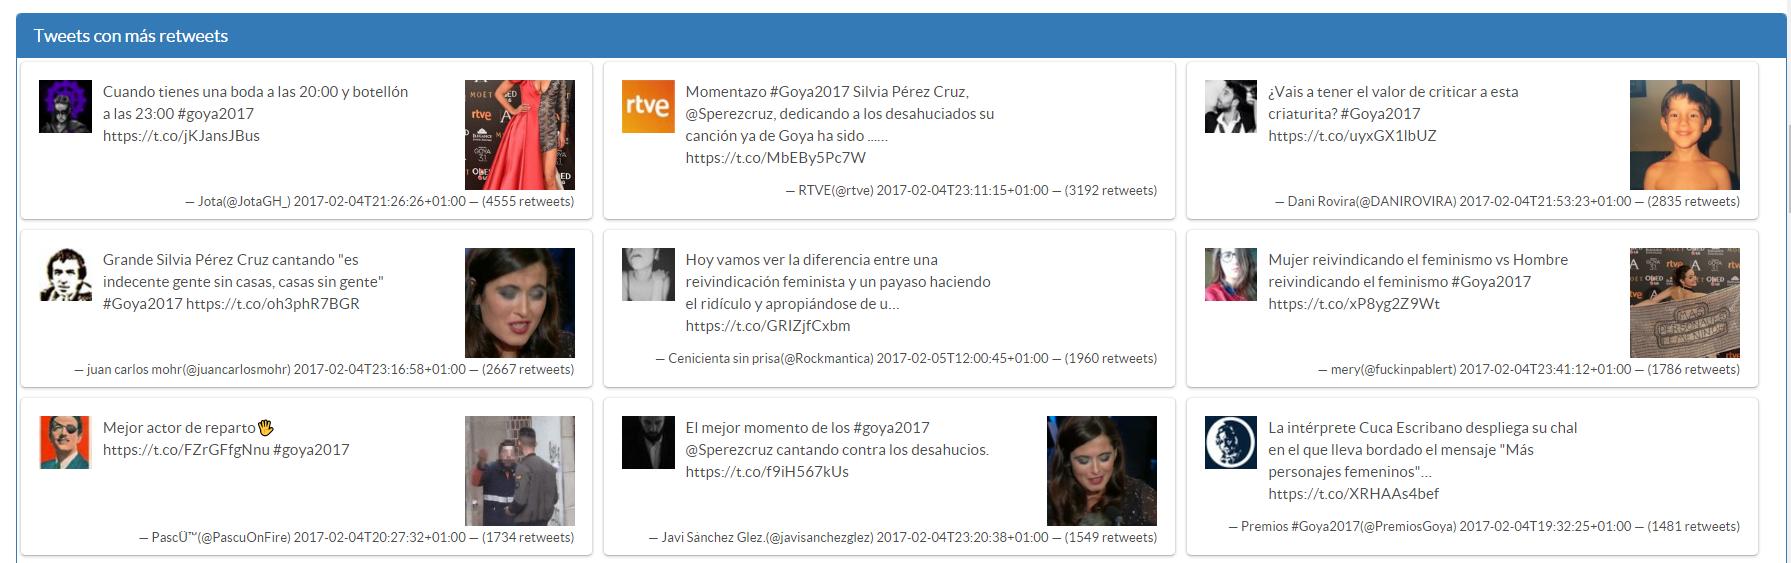 Engagement tweets #PremiosGoya